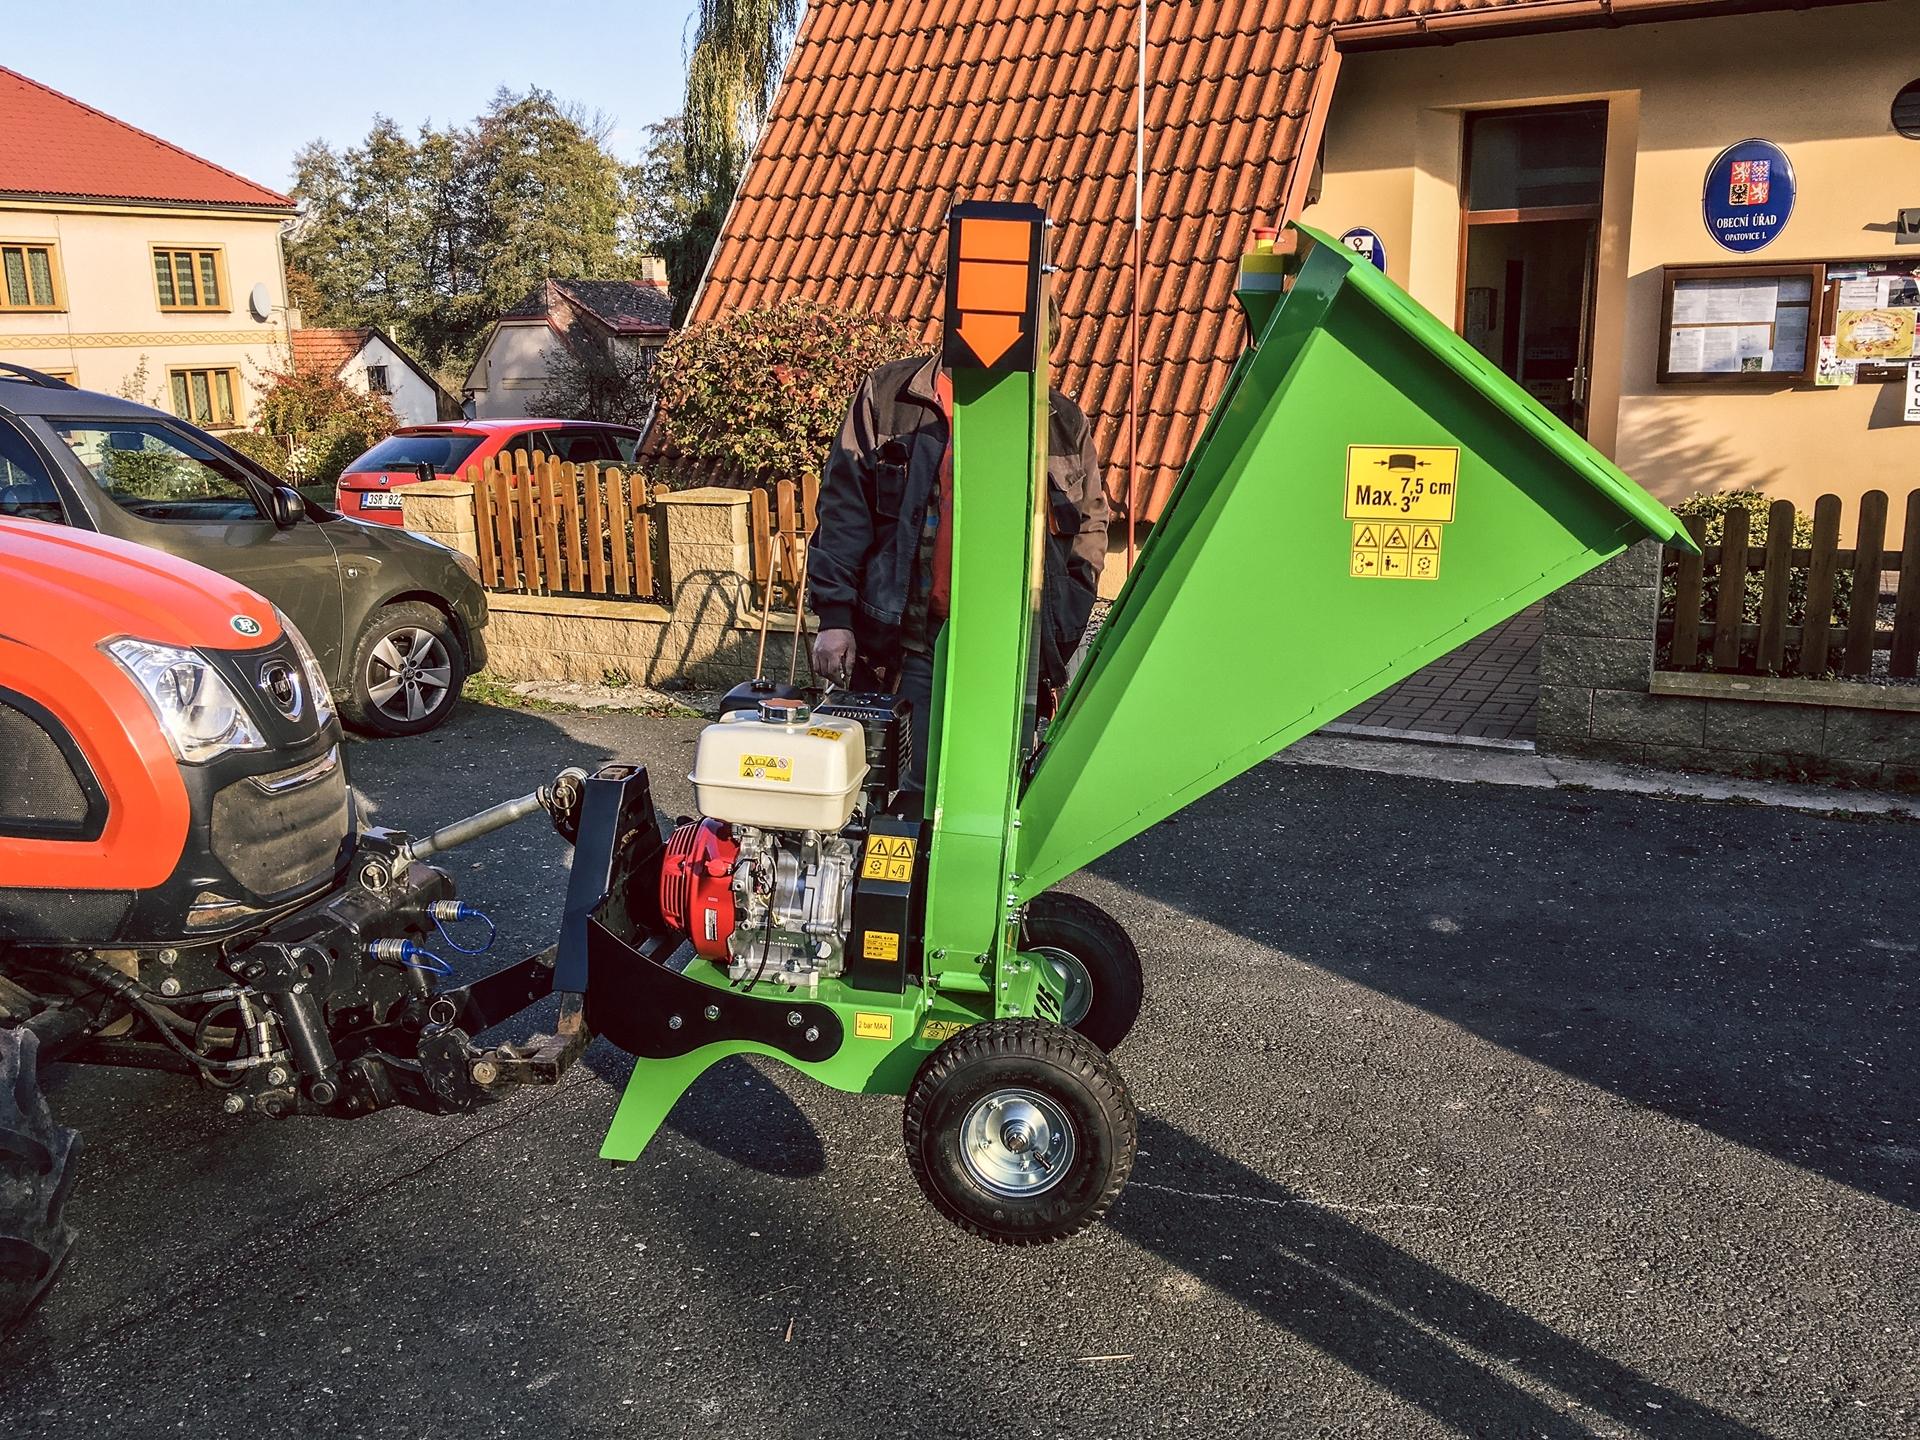 Traktor-Kioti-DK4510-se-stepkovacem-Laski3.JPG